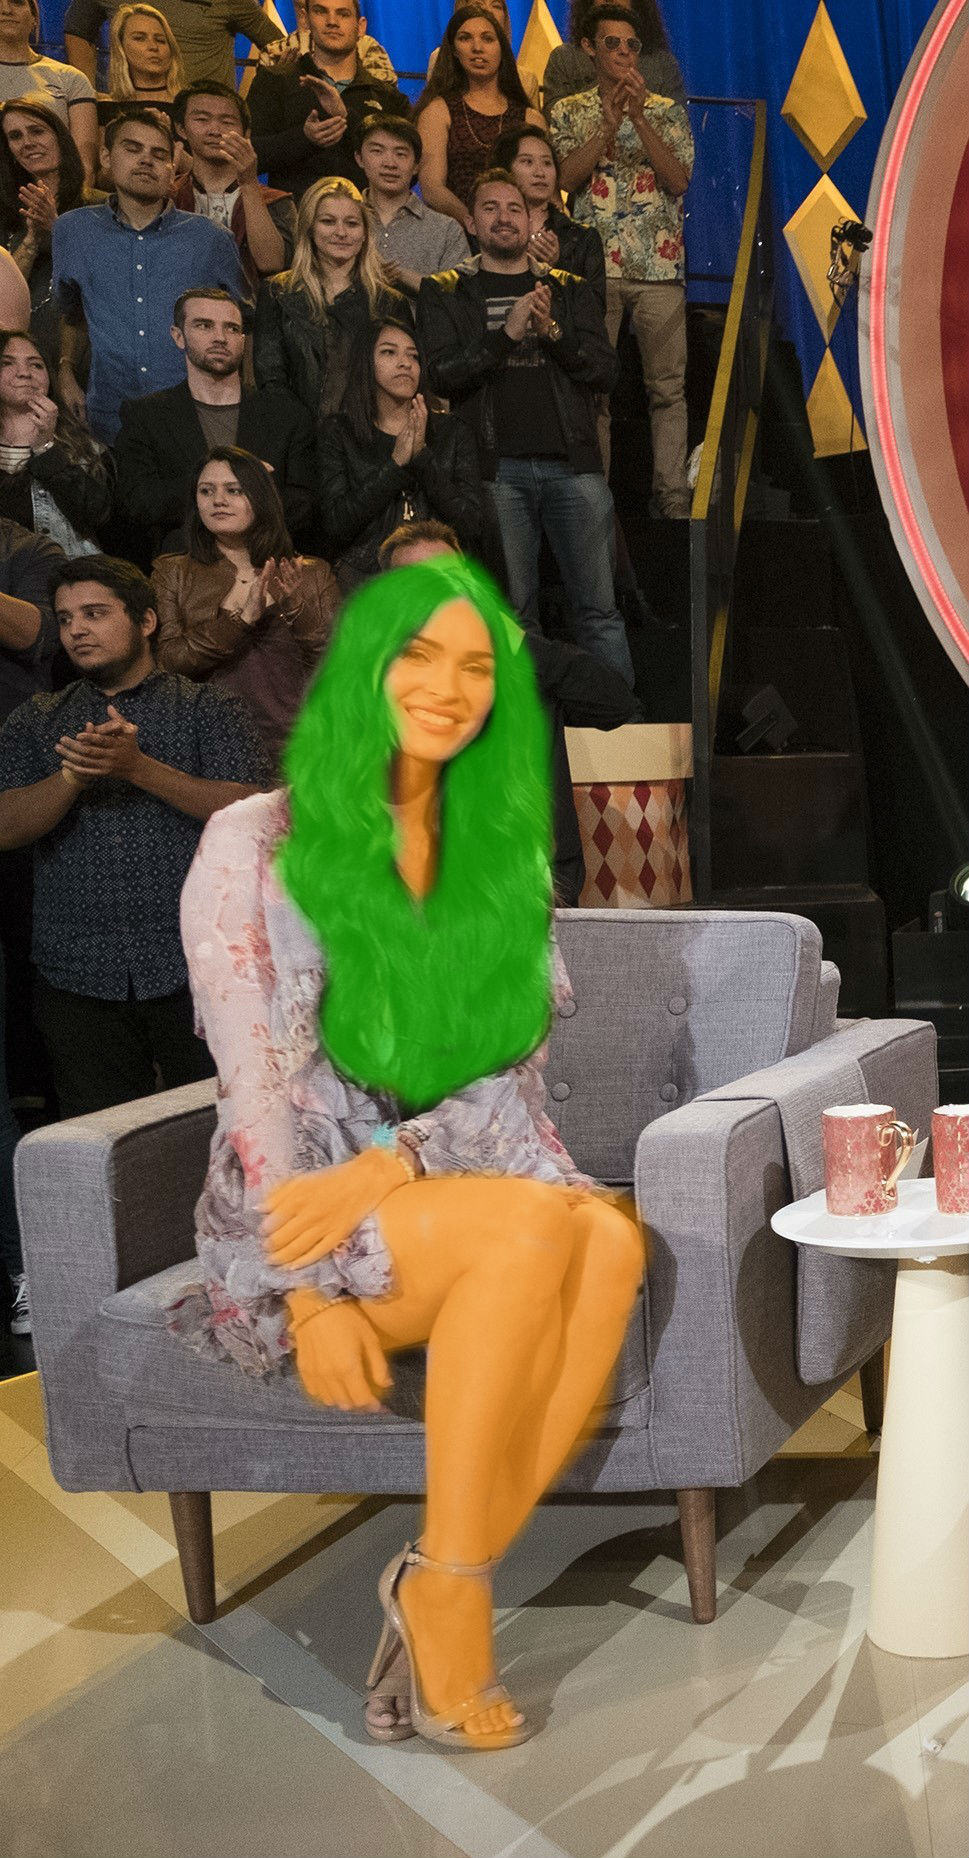 Loompa Girl Megan Fox by scotishjoker1edits